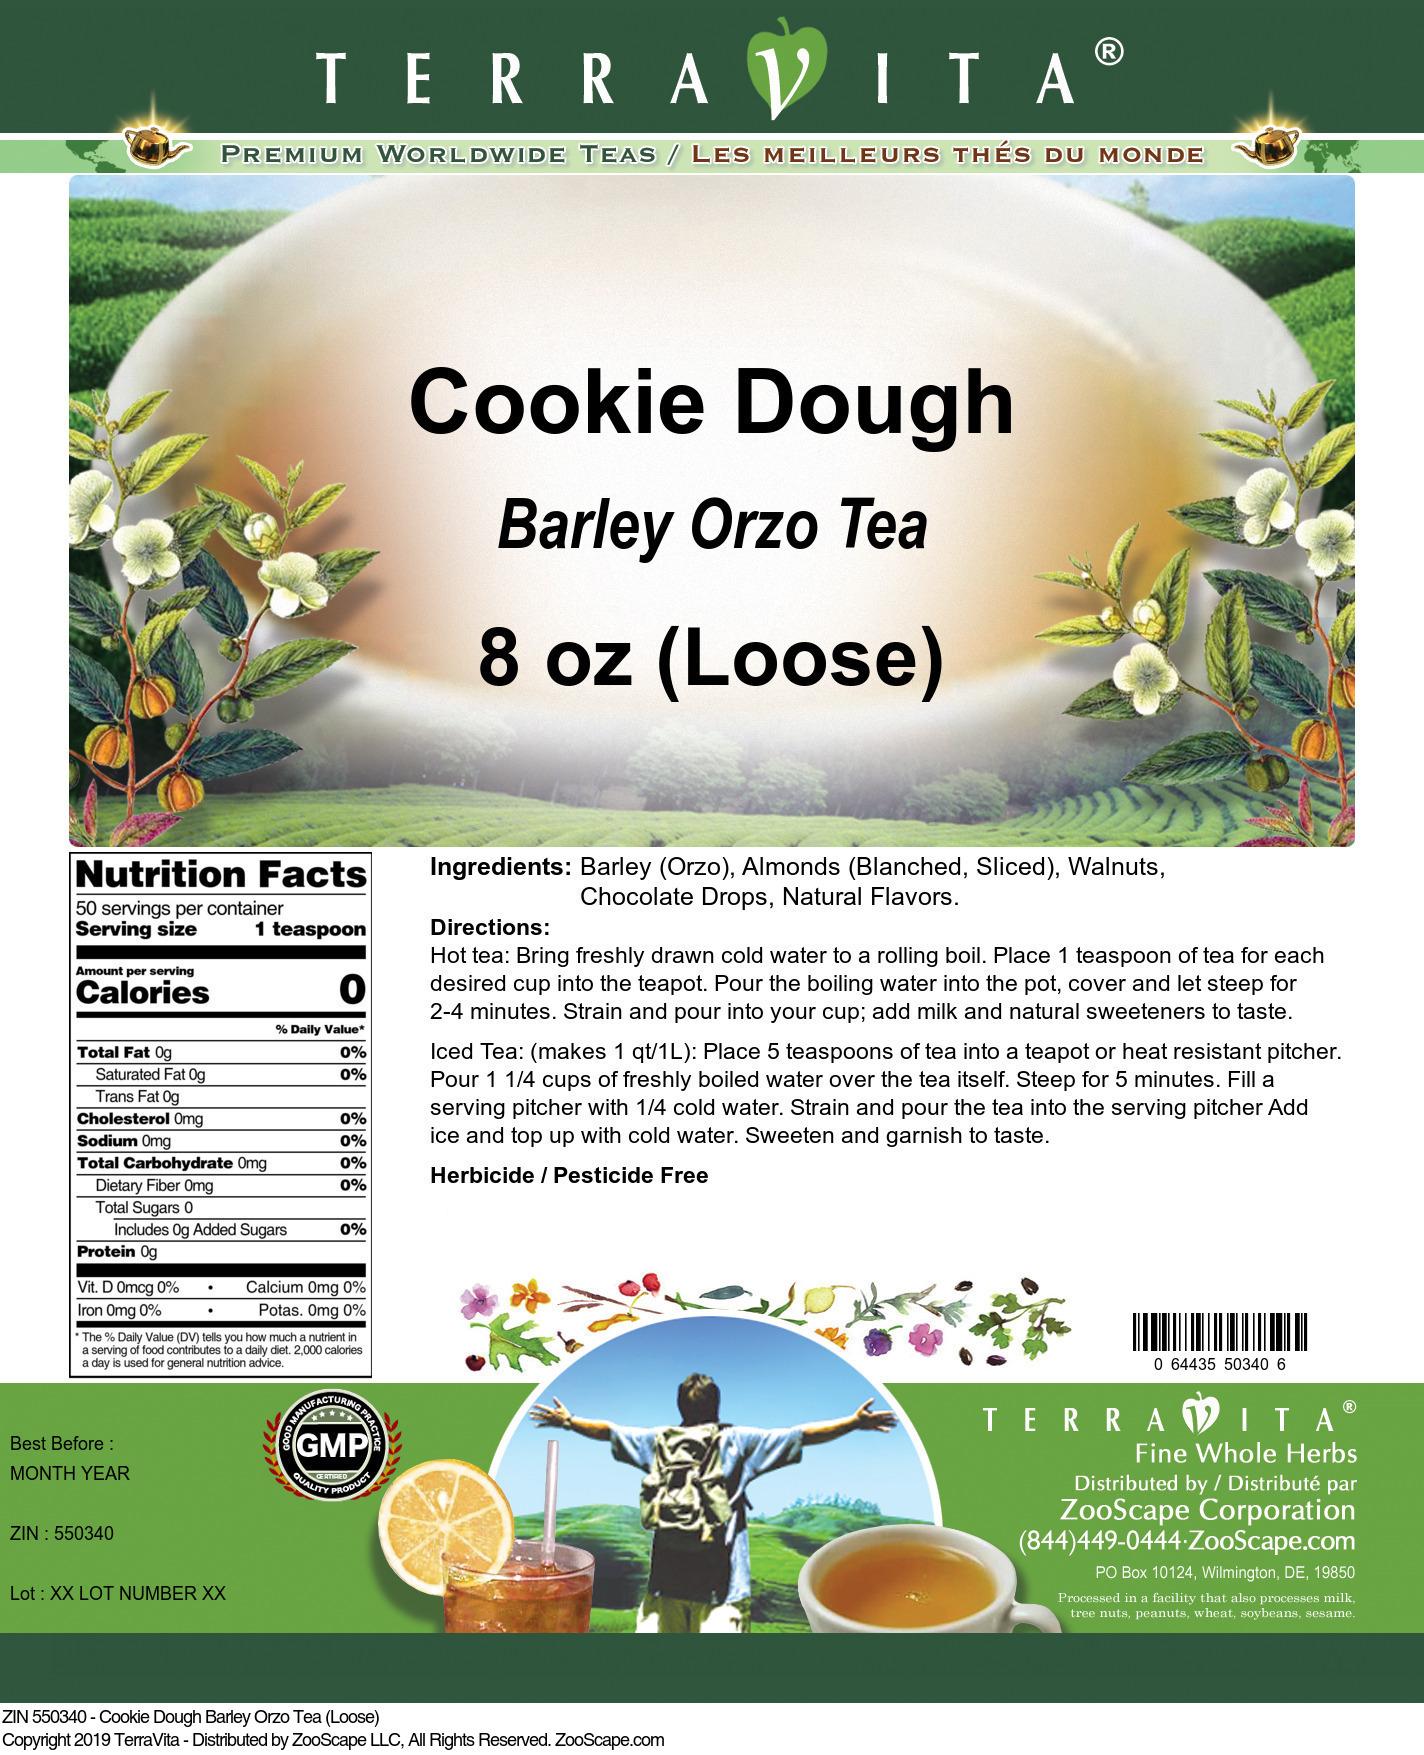 Cookie Dough Barley Orzo